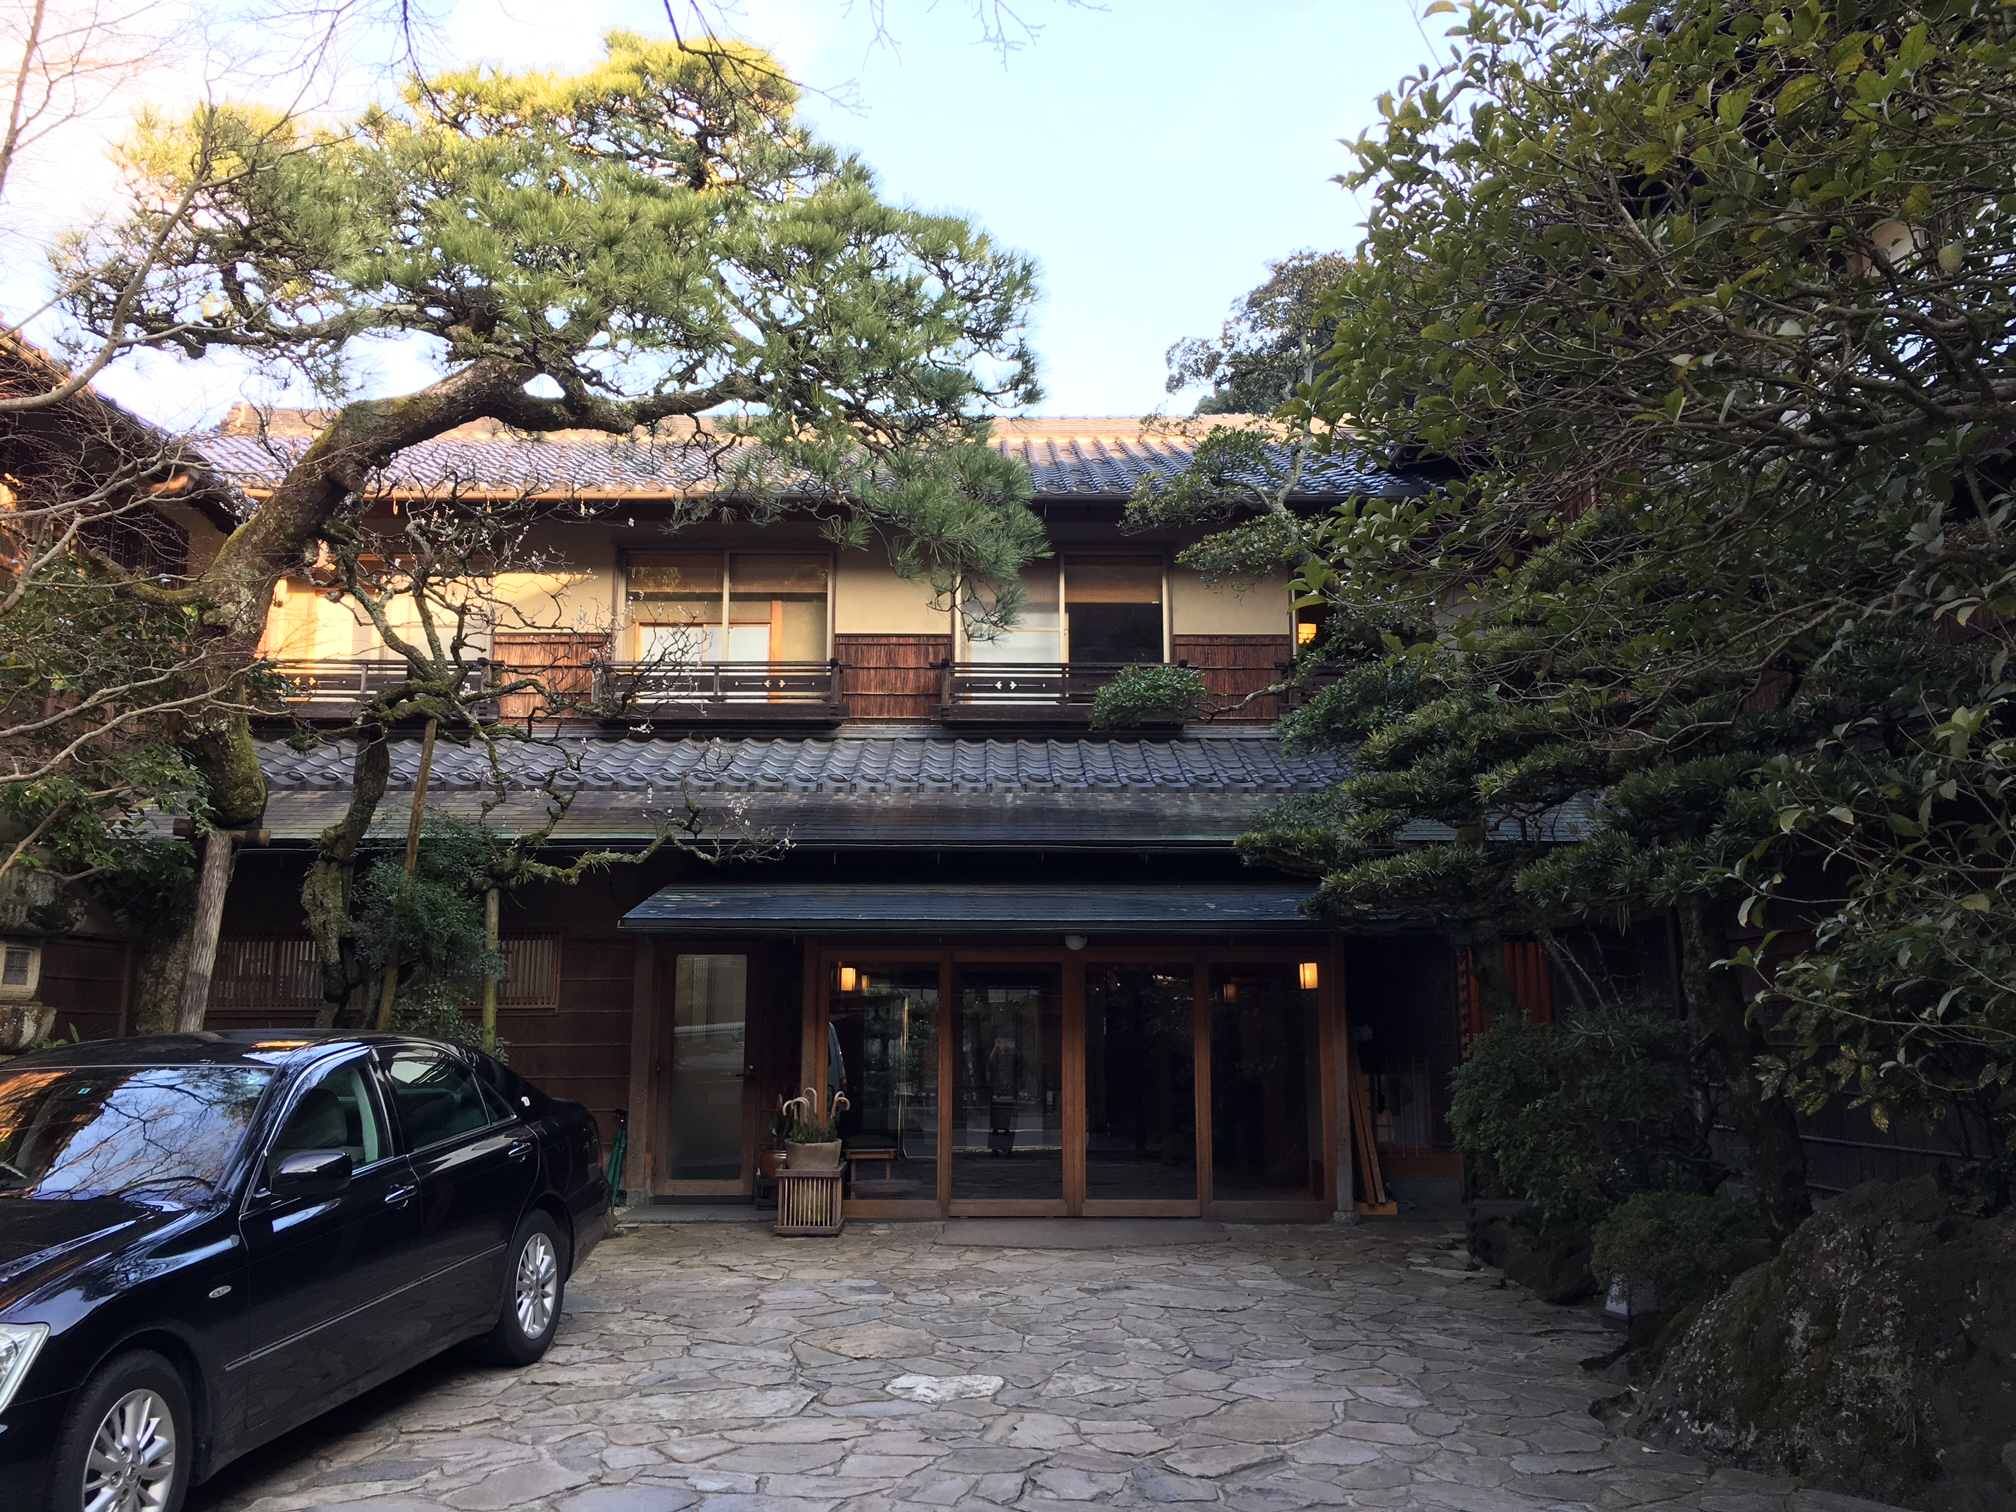 Nishimuraya Honkan Courtyard and Entrance, Kinosaki Onsen